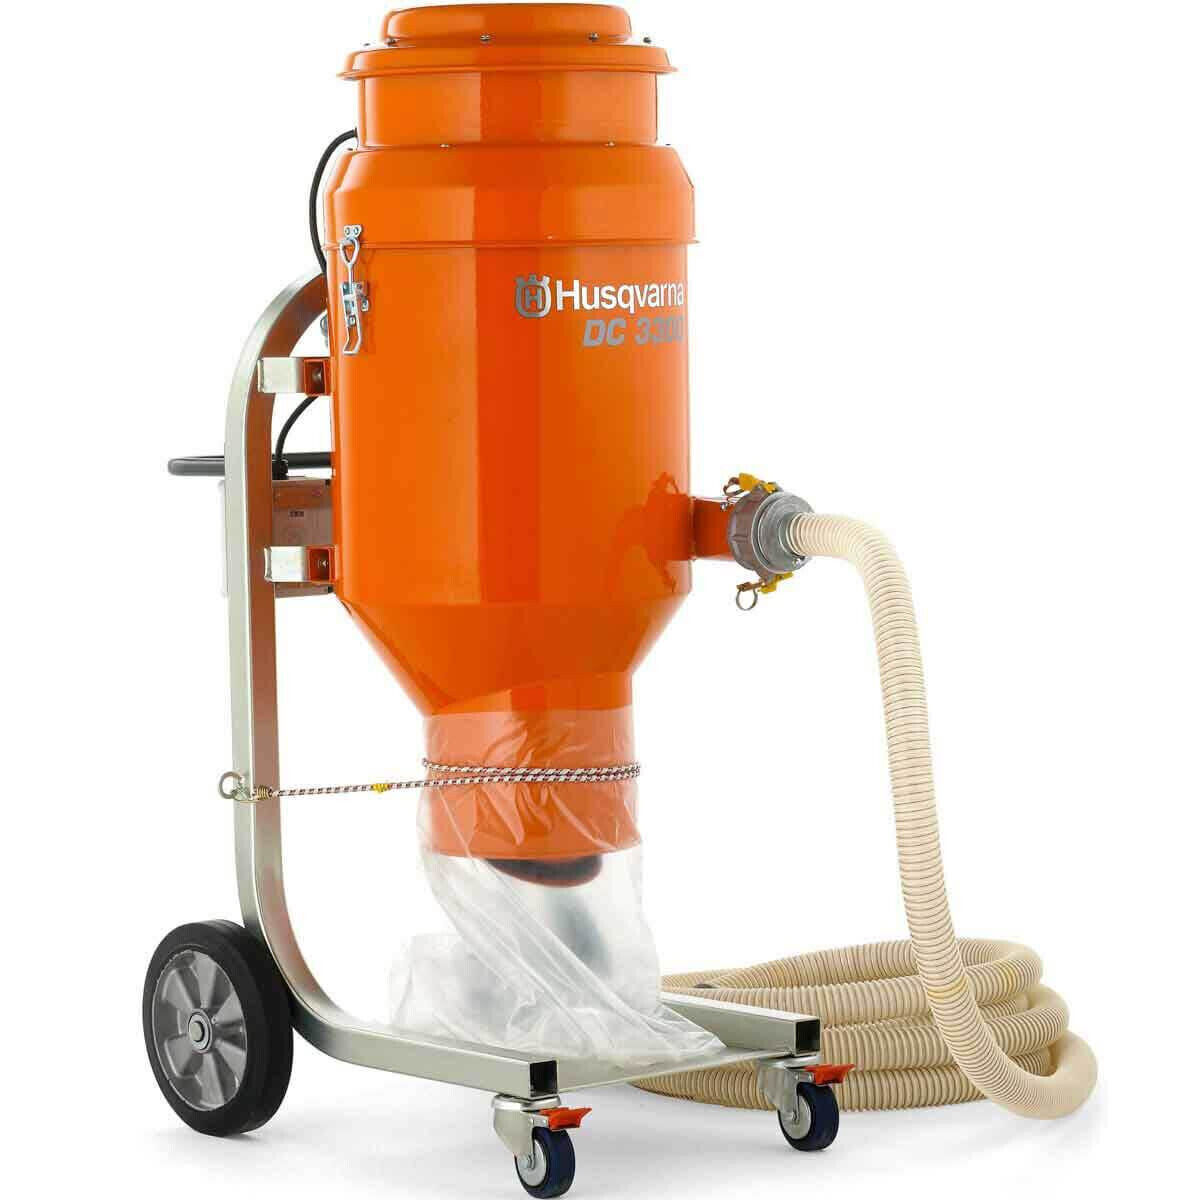 DC 3300 Vacuum with Flexible Hose